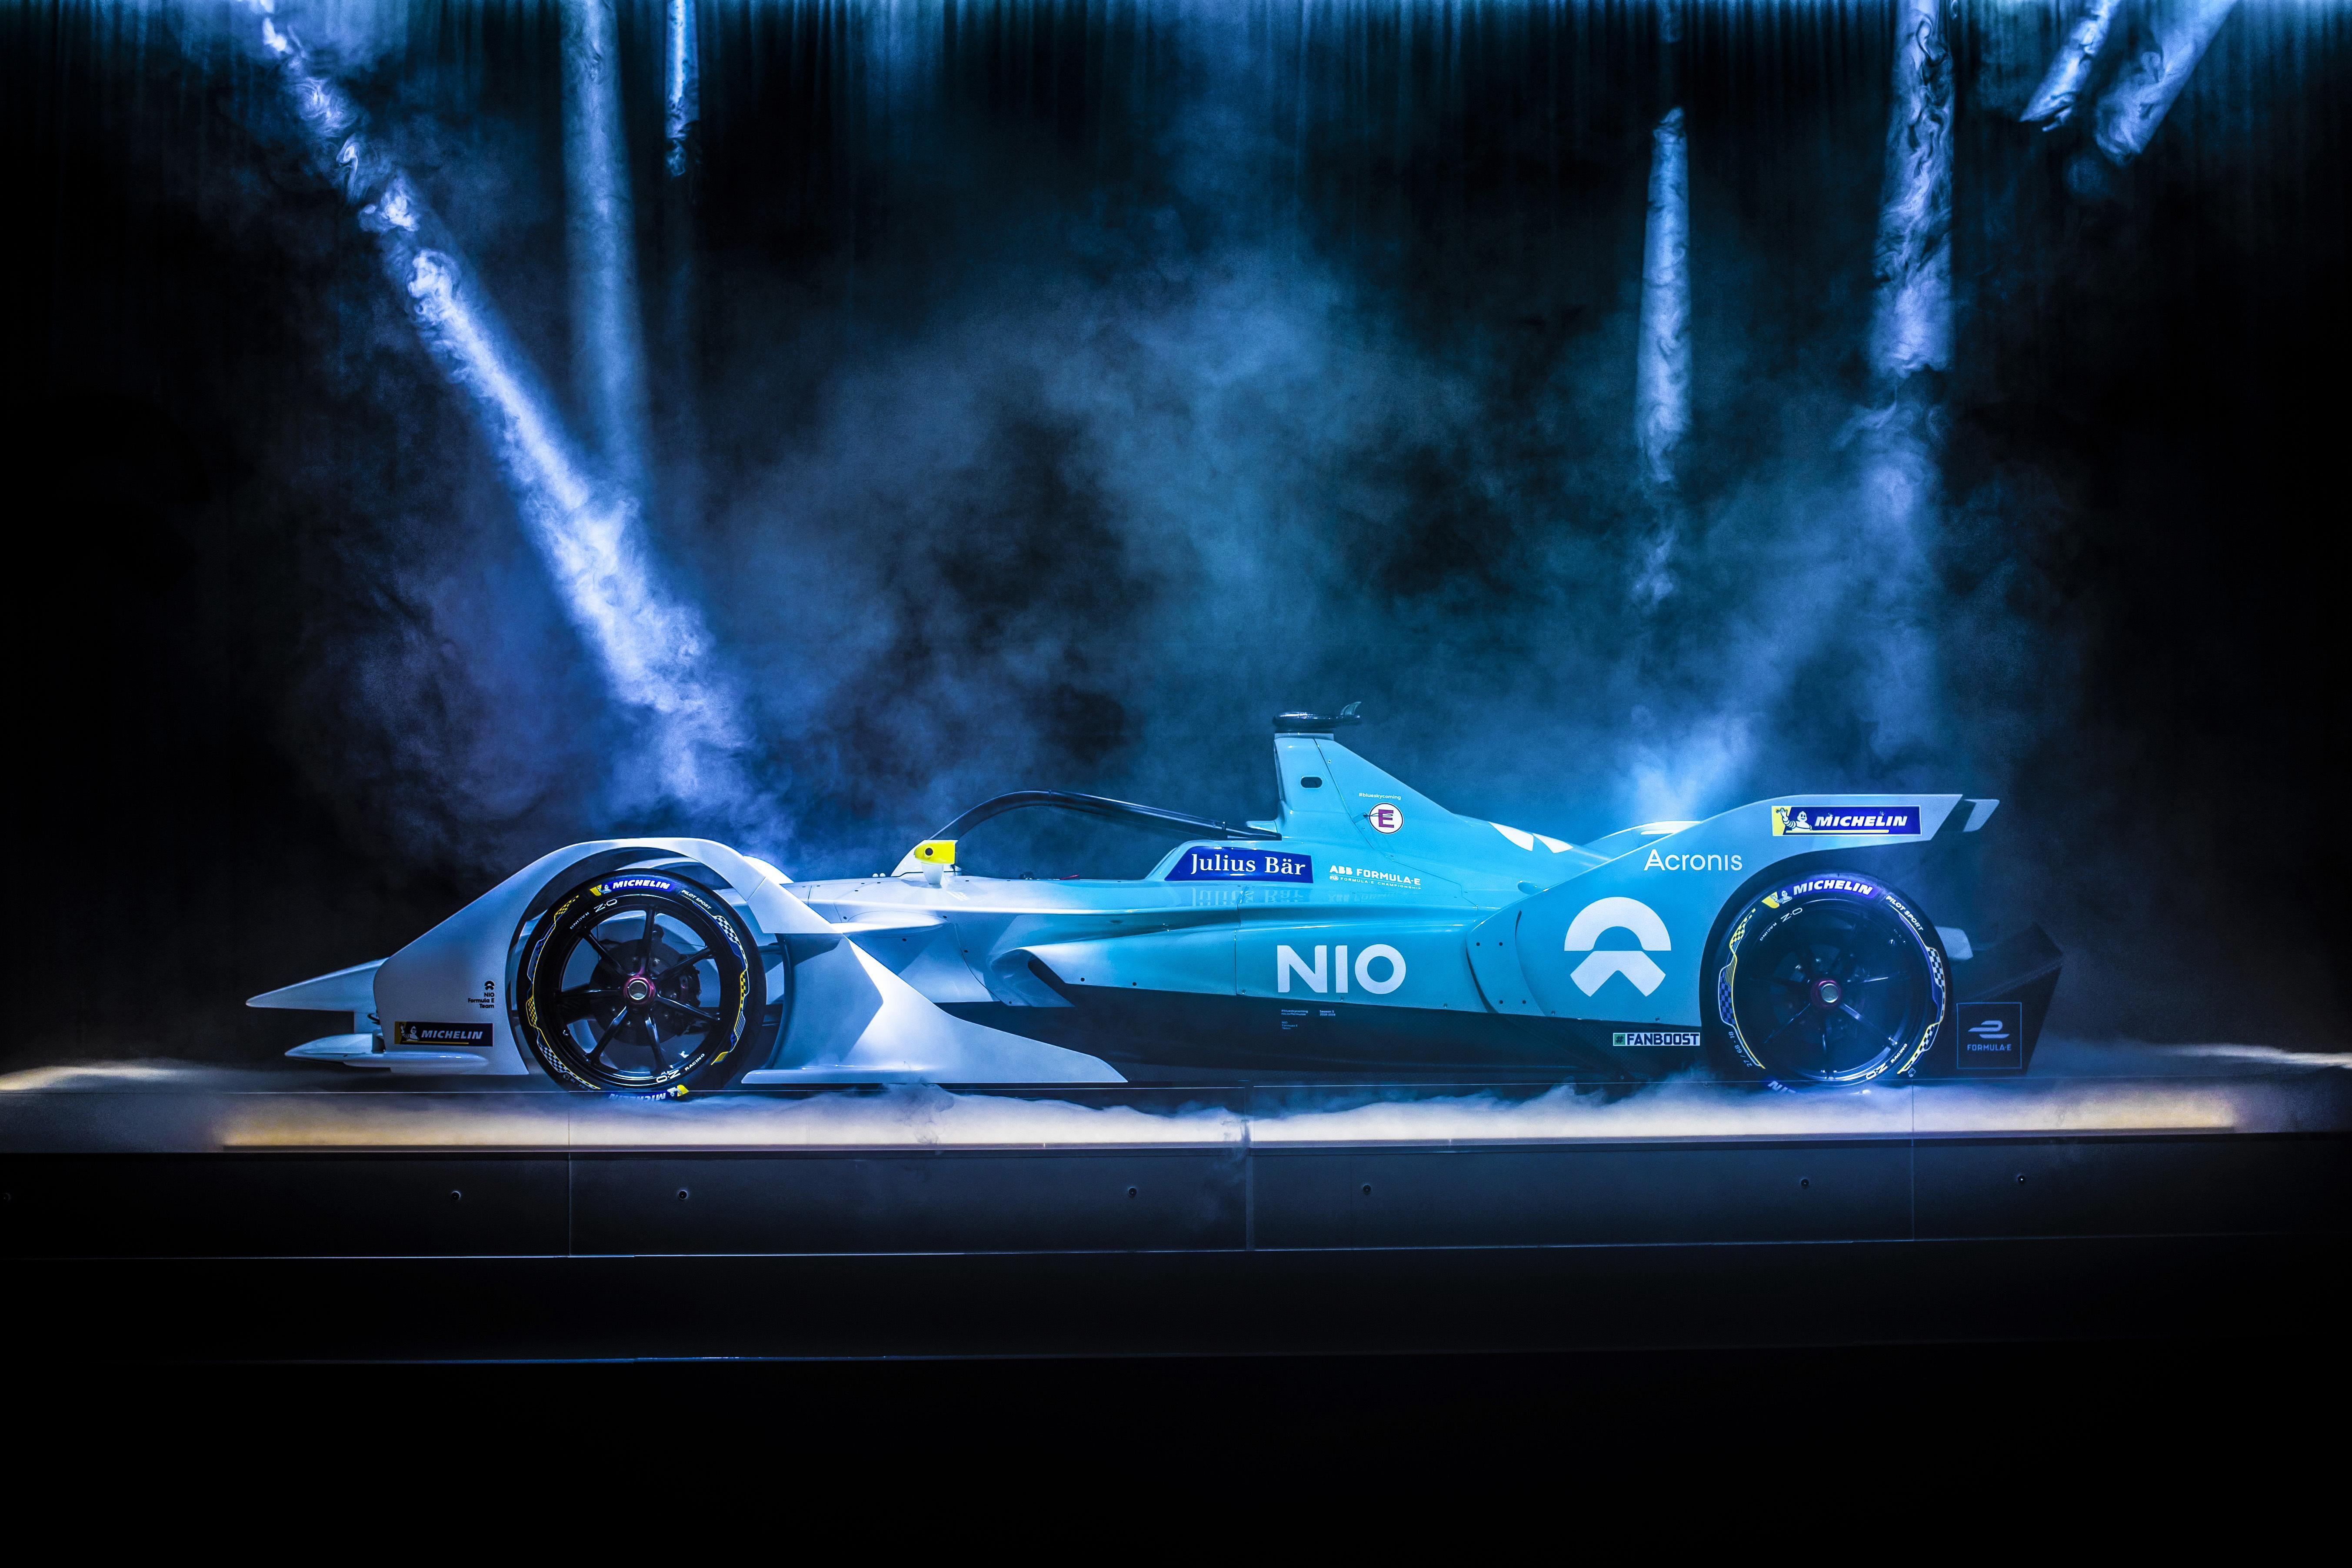 NIO Formula E GEN2